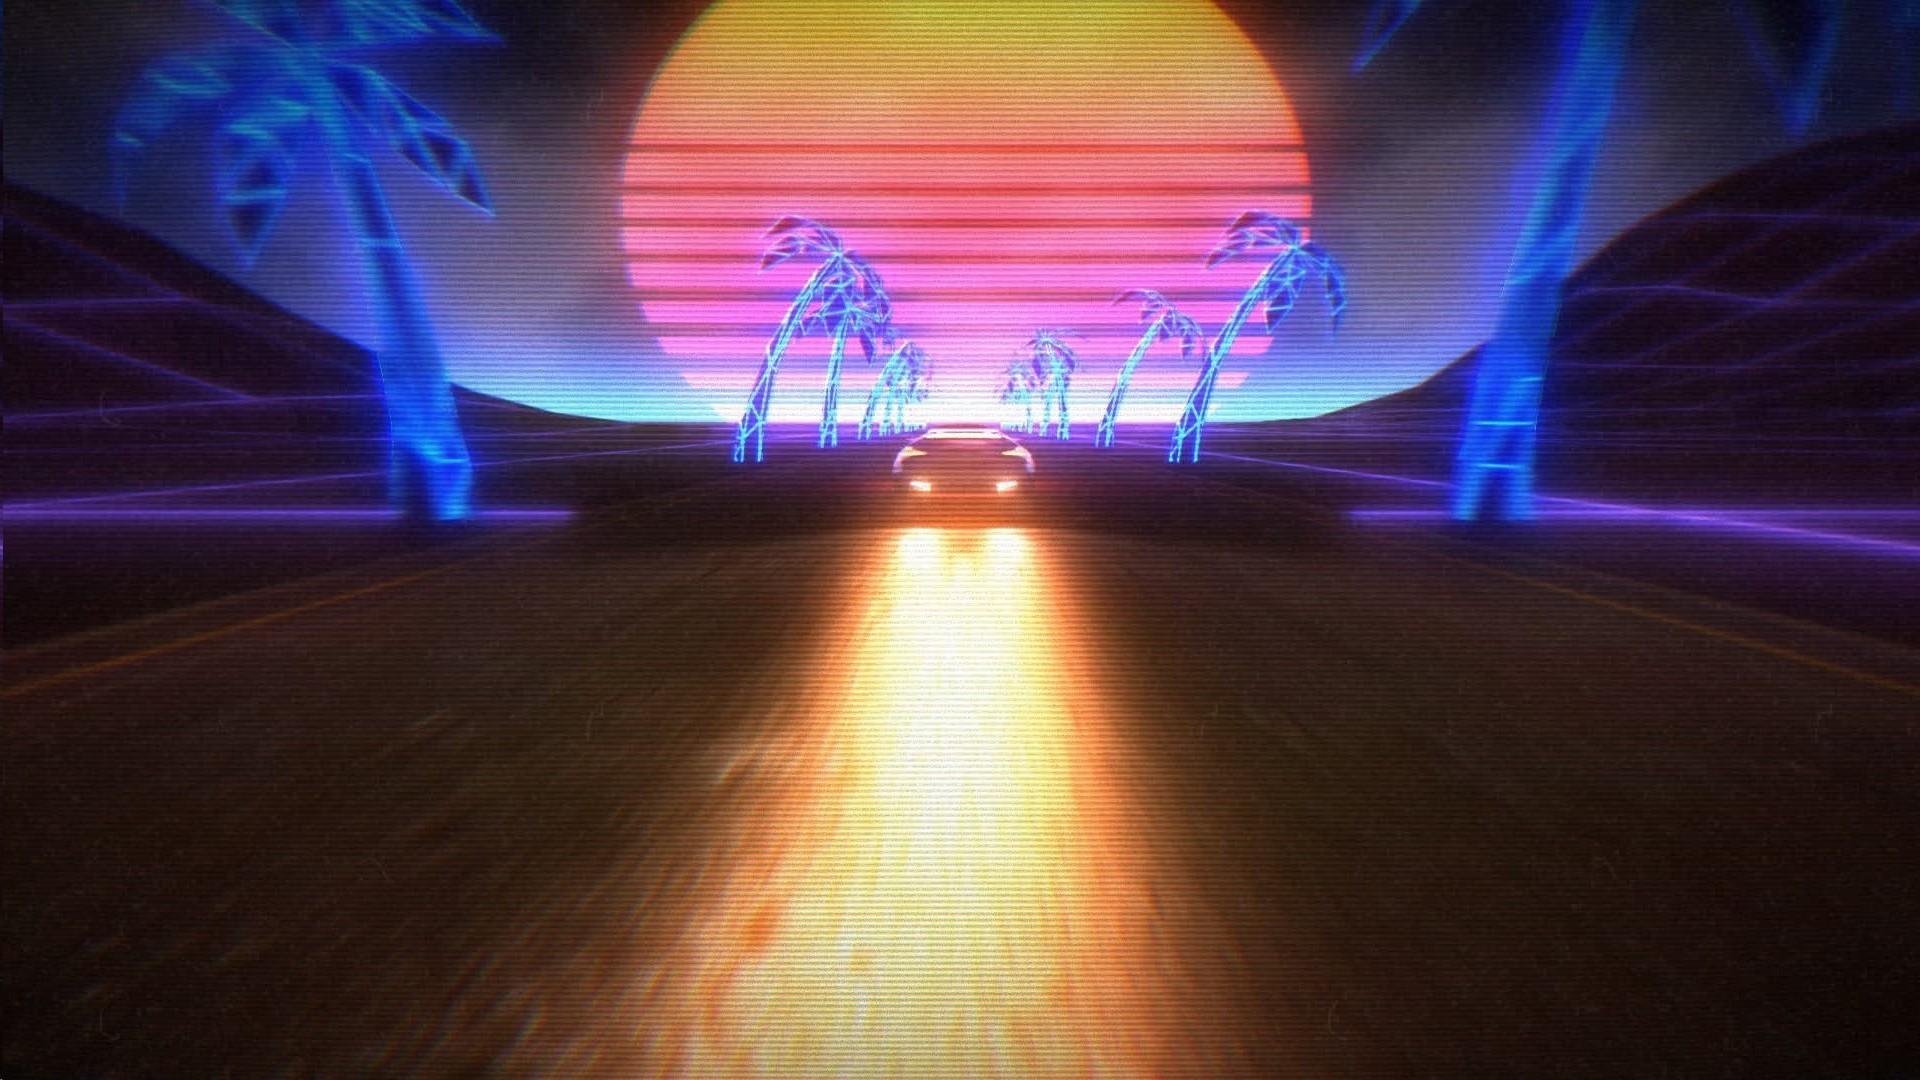 General New Retro Wave synthwave 1980s neon car retro games